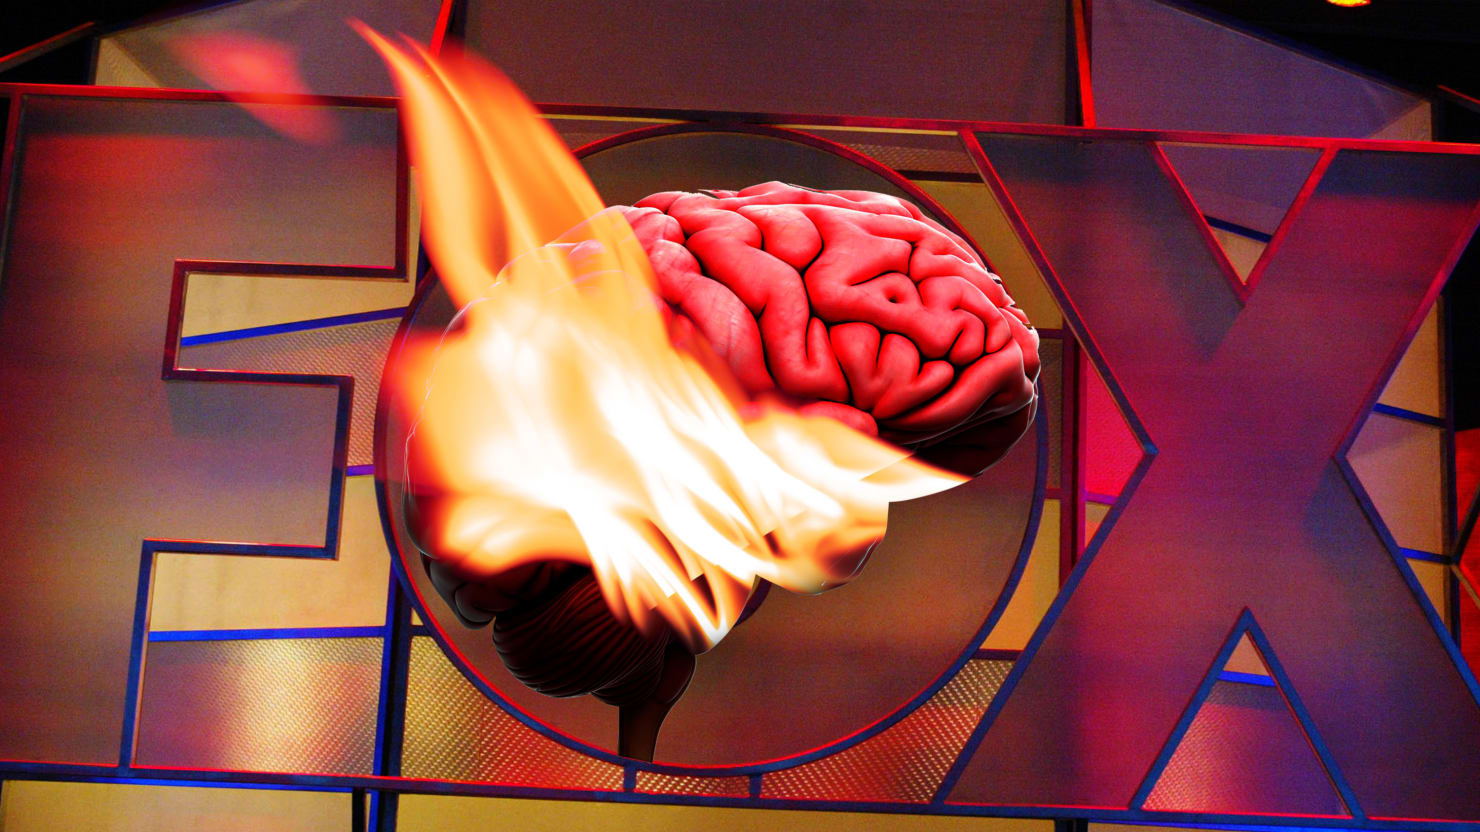 Fox News Lobotomizes Its 'Brain Room,' Cuts Fact-Based Journalism